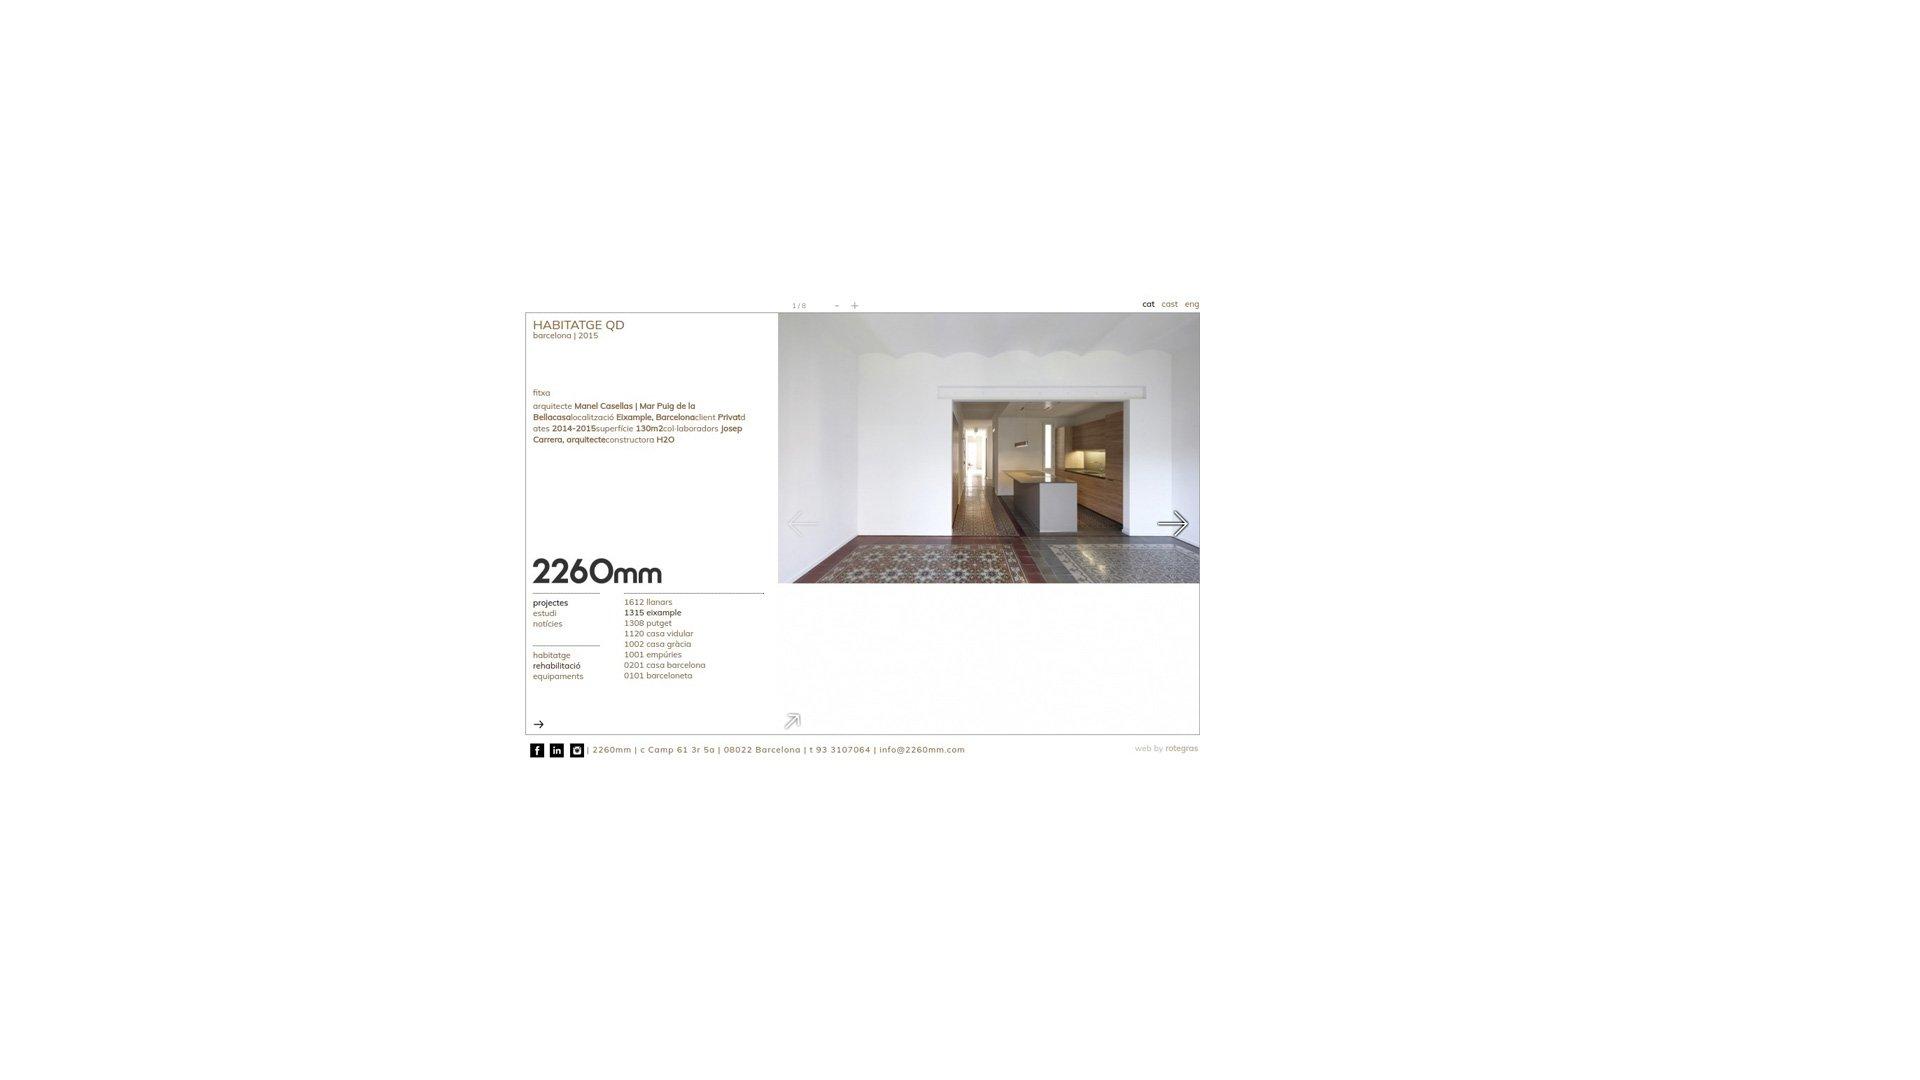 2260mm web design